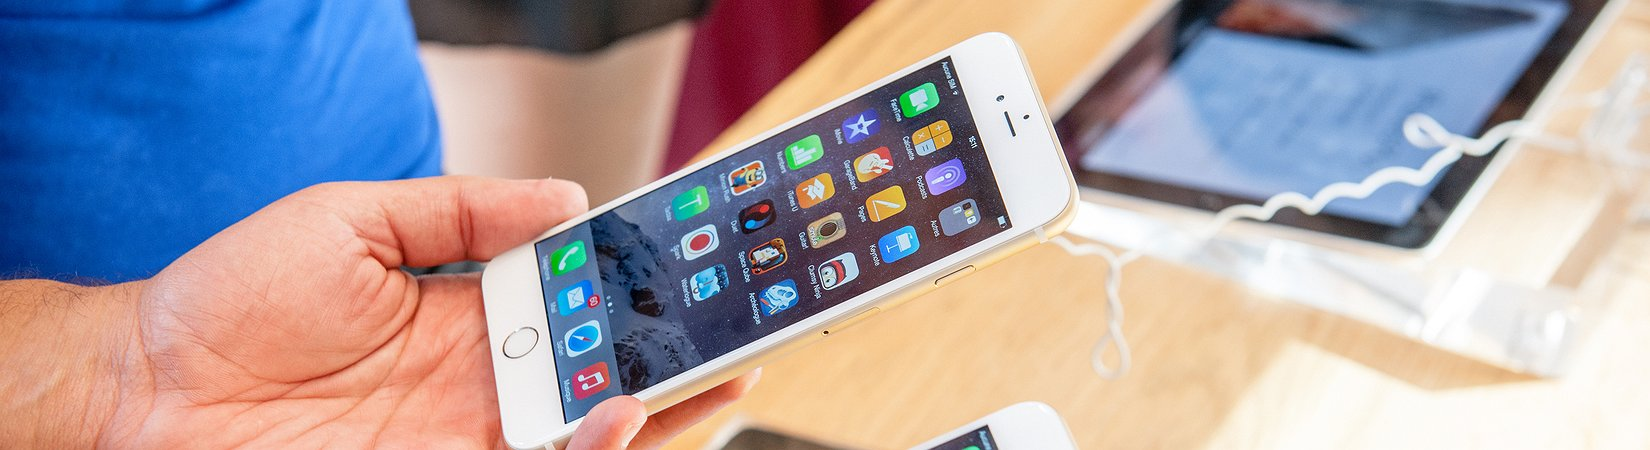 Судьба Touch ID — главная интрига нового iPhone 8